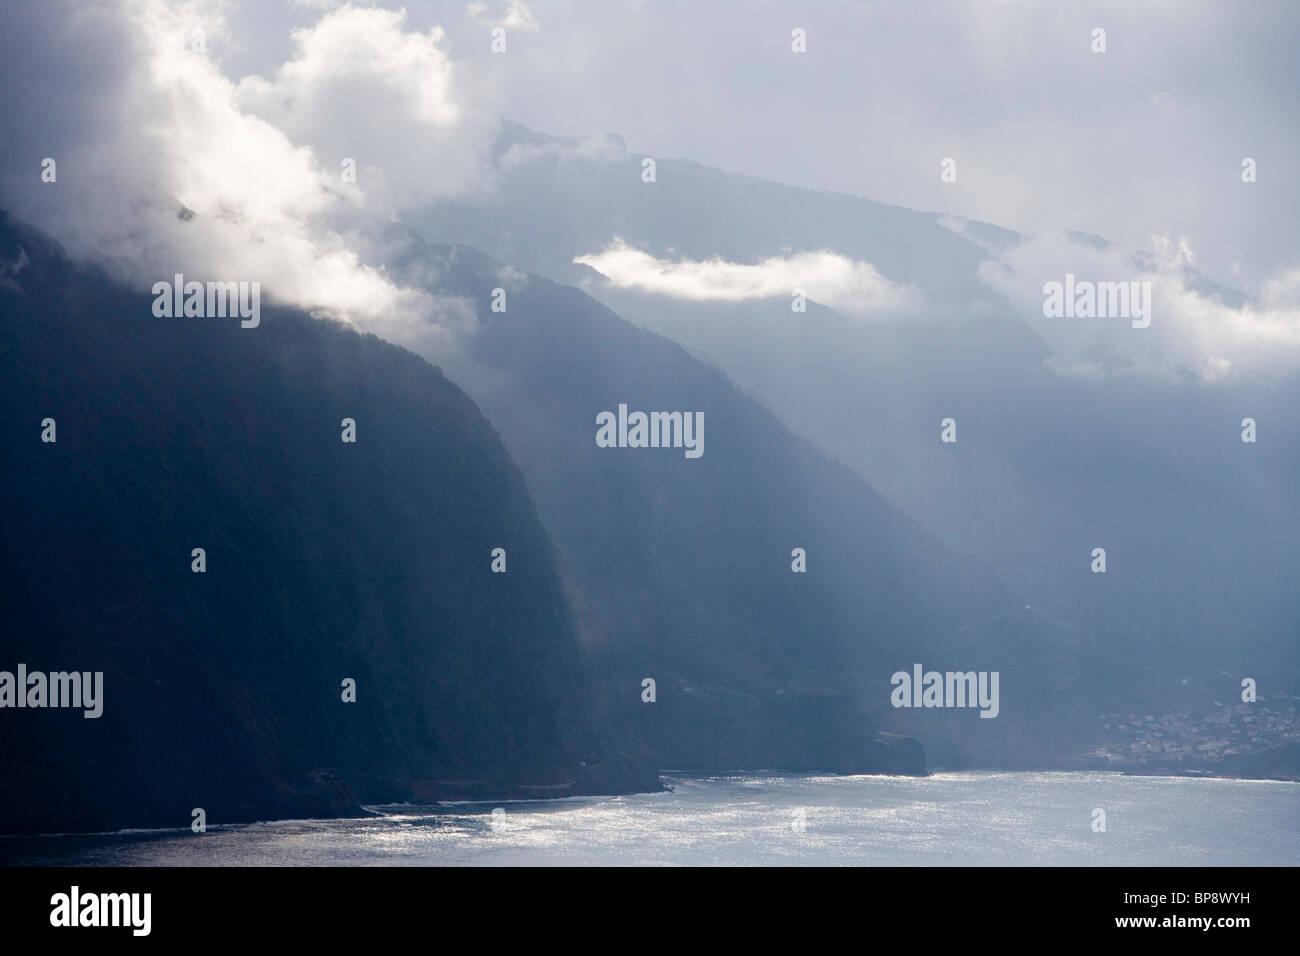 Misty coastline on the North Coast, near Arco de Sao Jorge, Madeira, Portugal - Stock Image